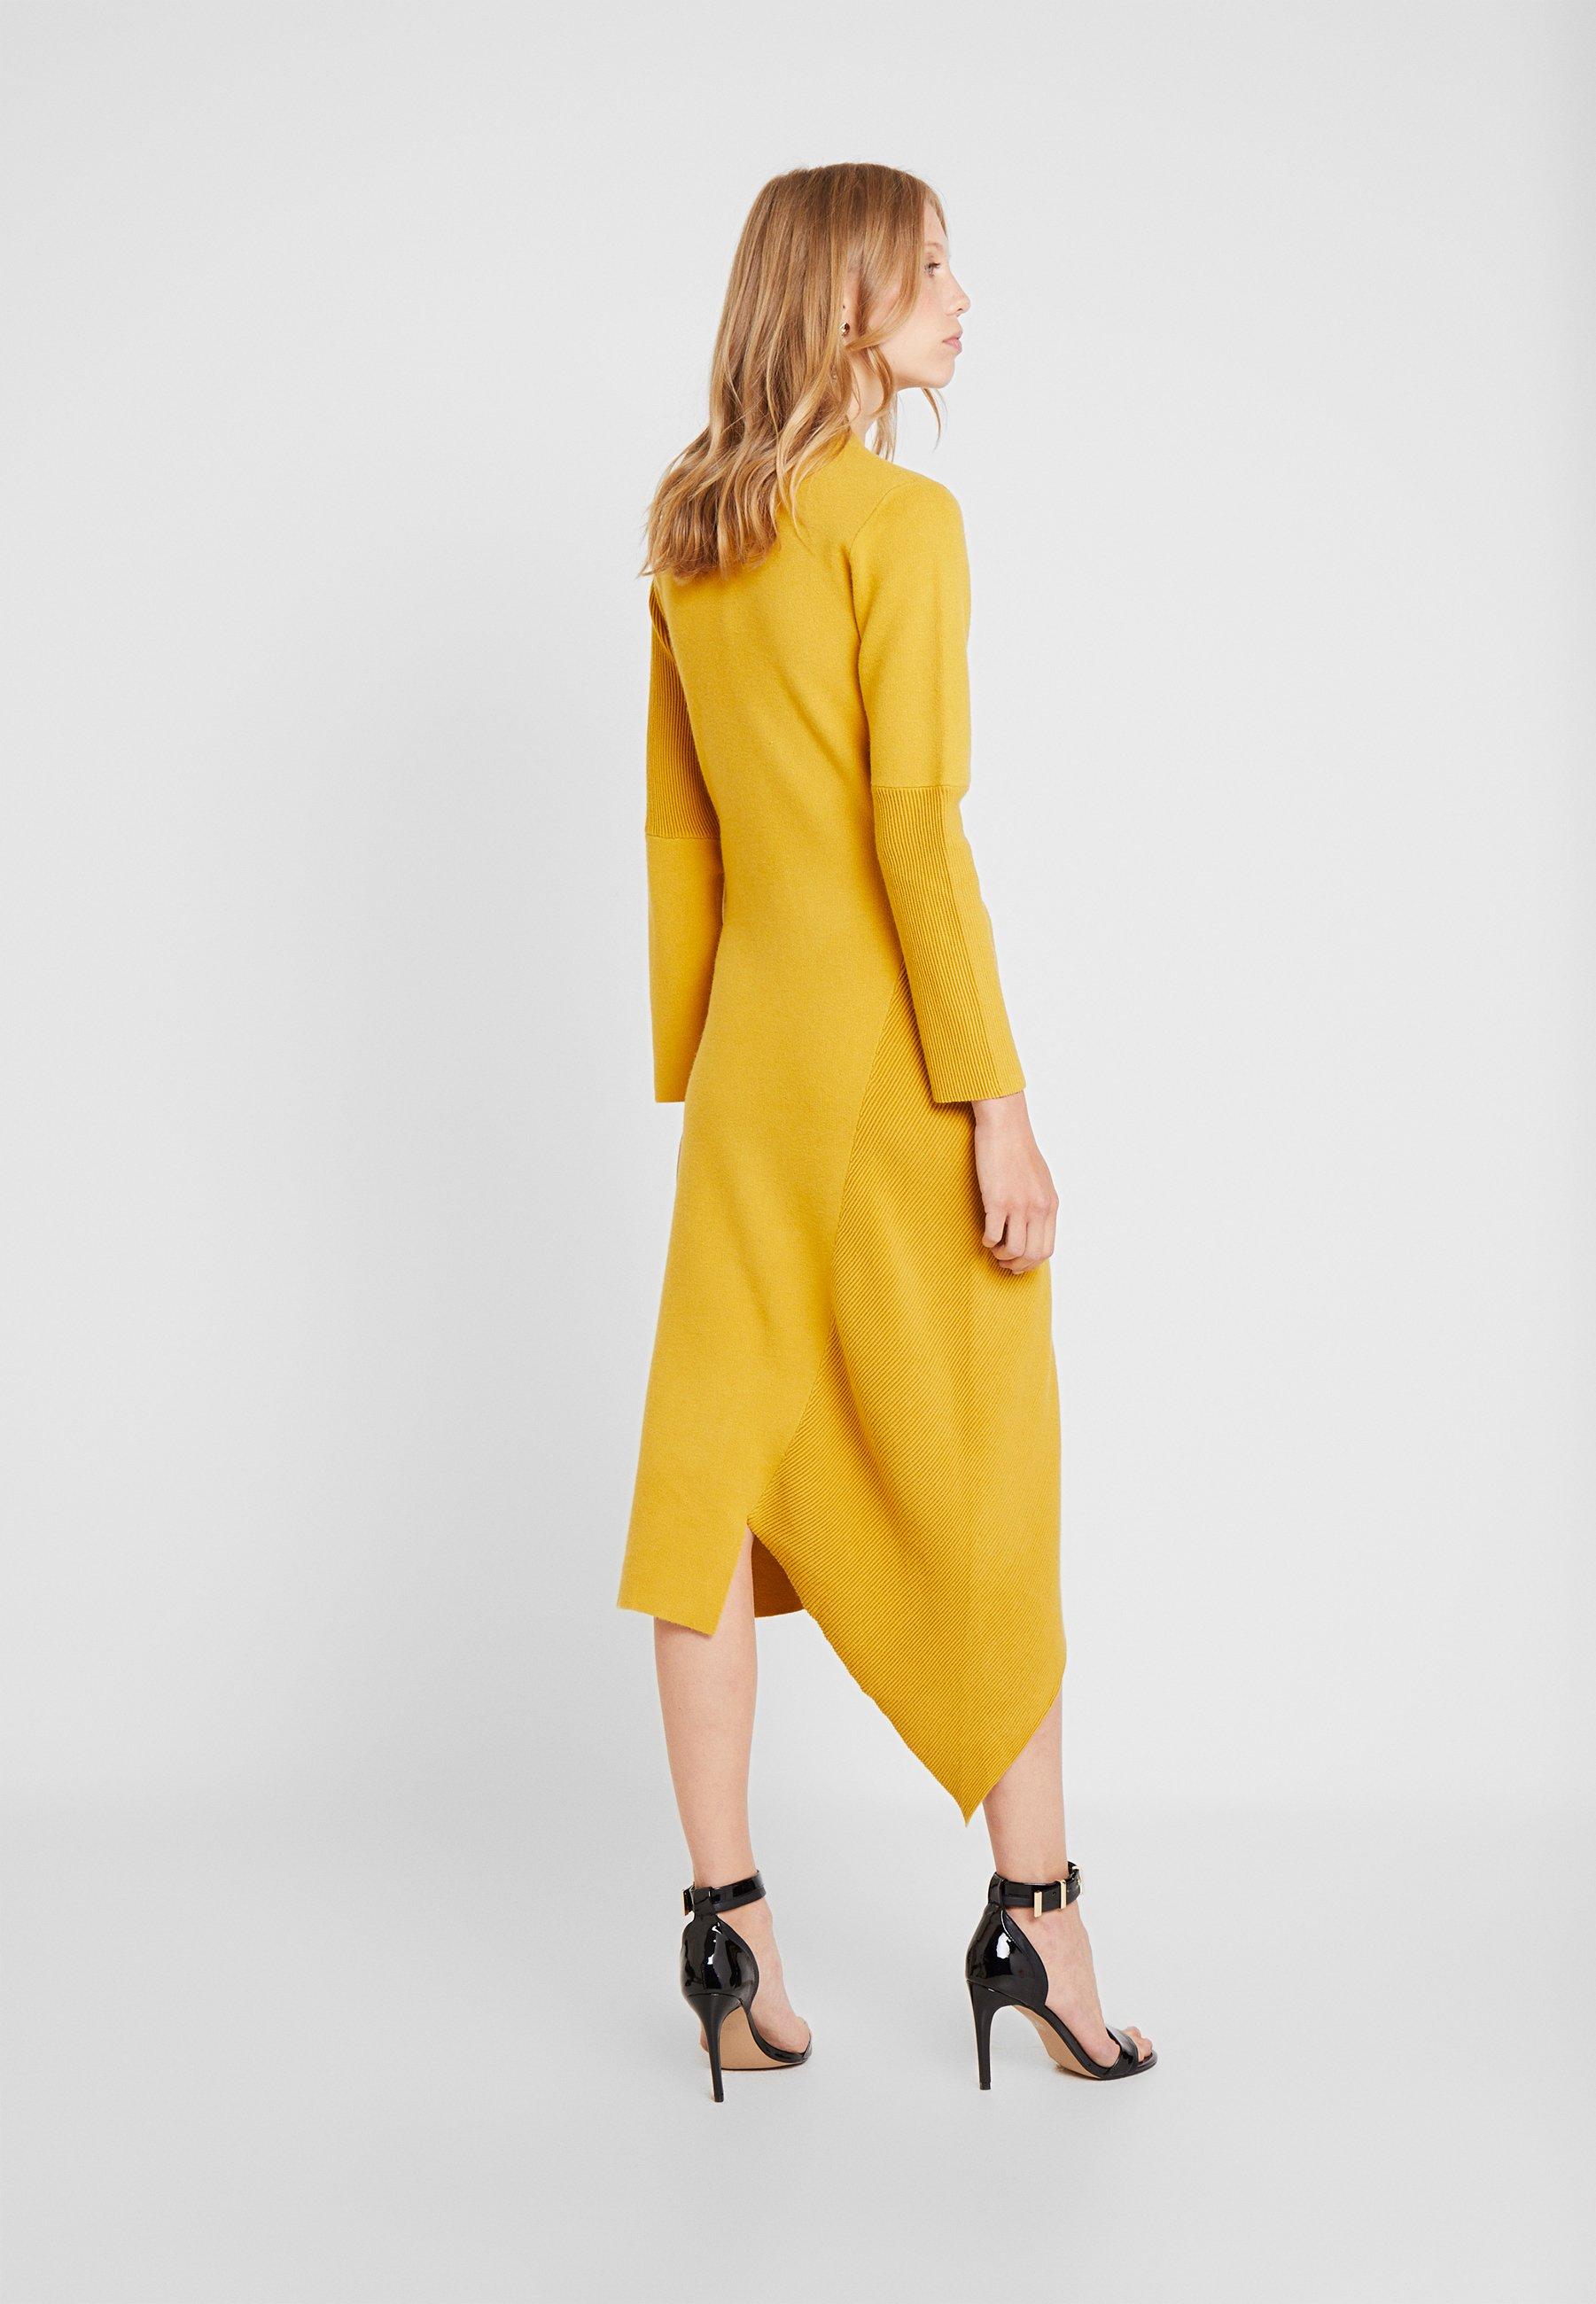 Apart Apart DressRobe DressRobe Yellow Longue Longue Yellow DressRobe Apart Longue DressRobe Apart Yellow UMpLqVSzG